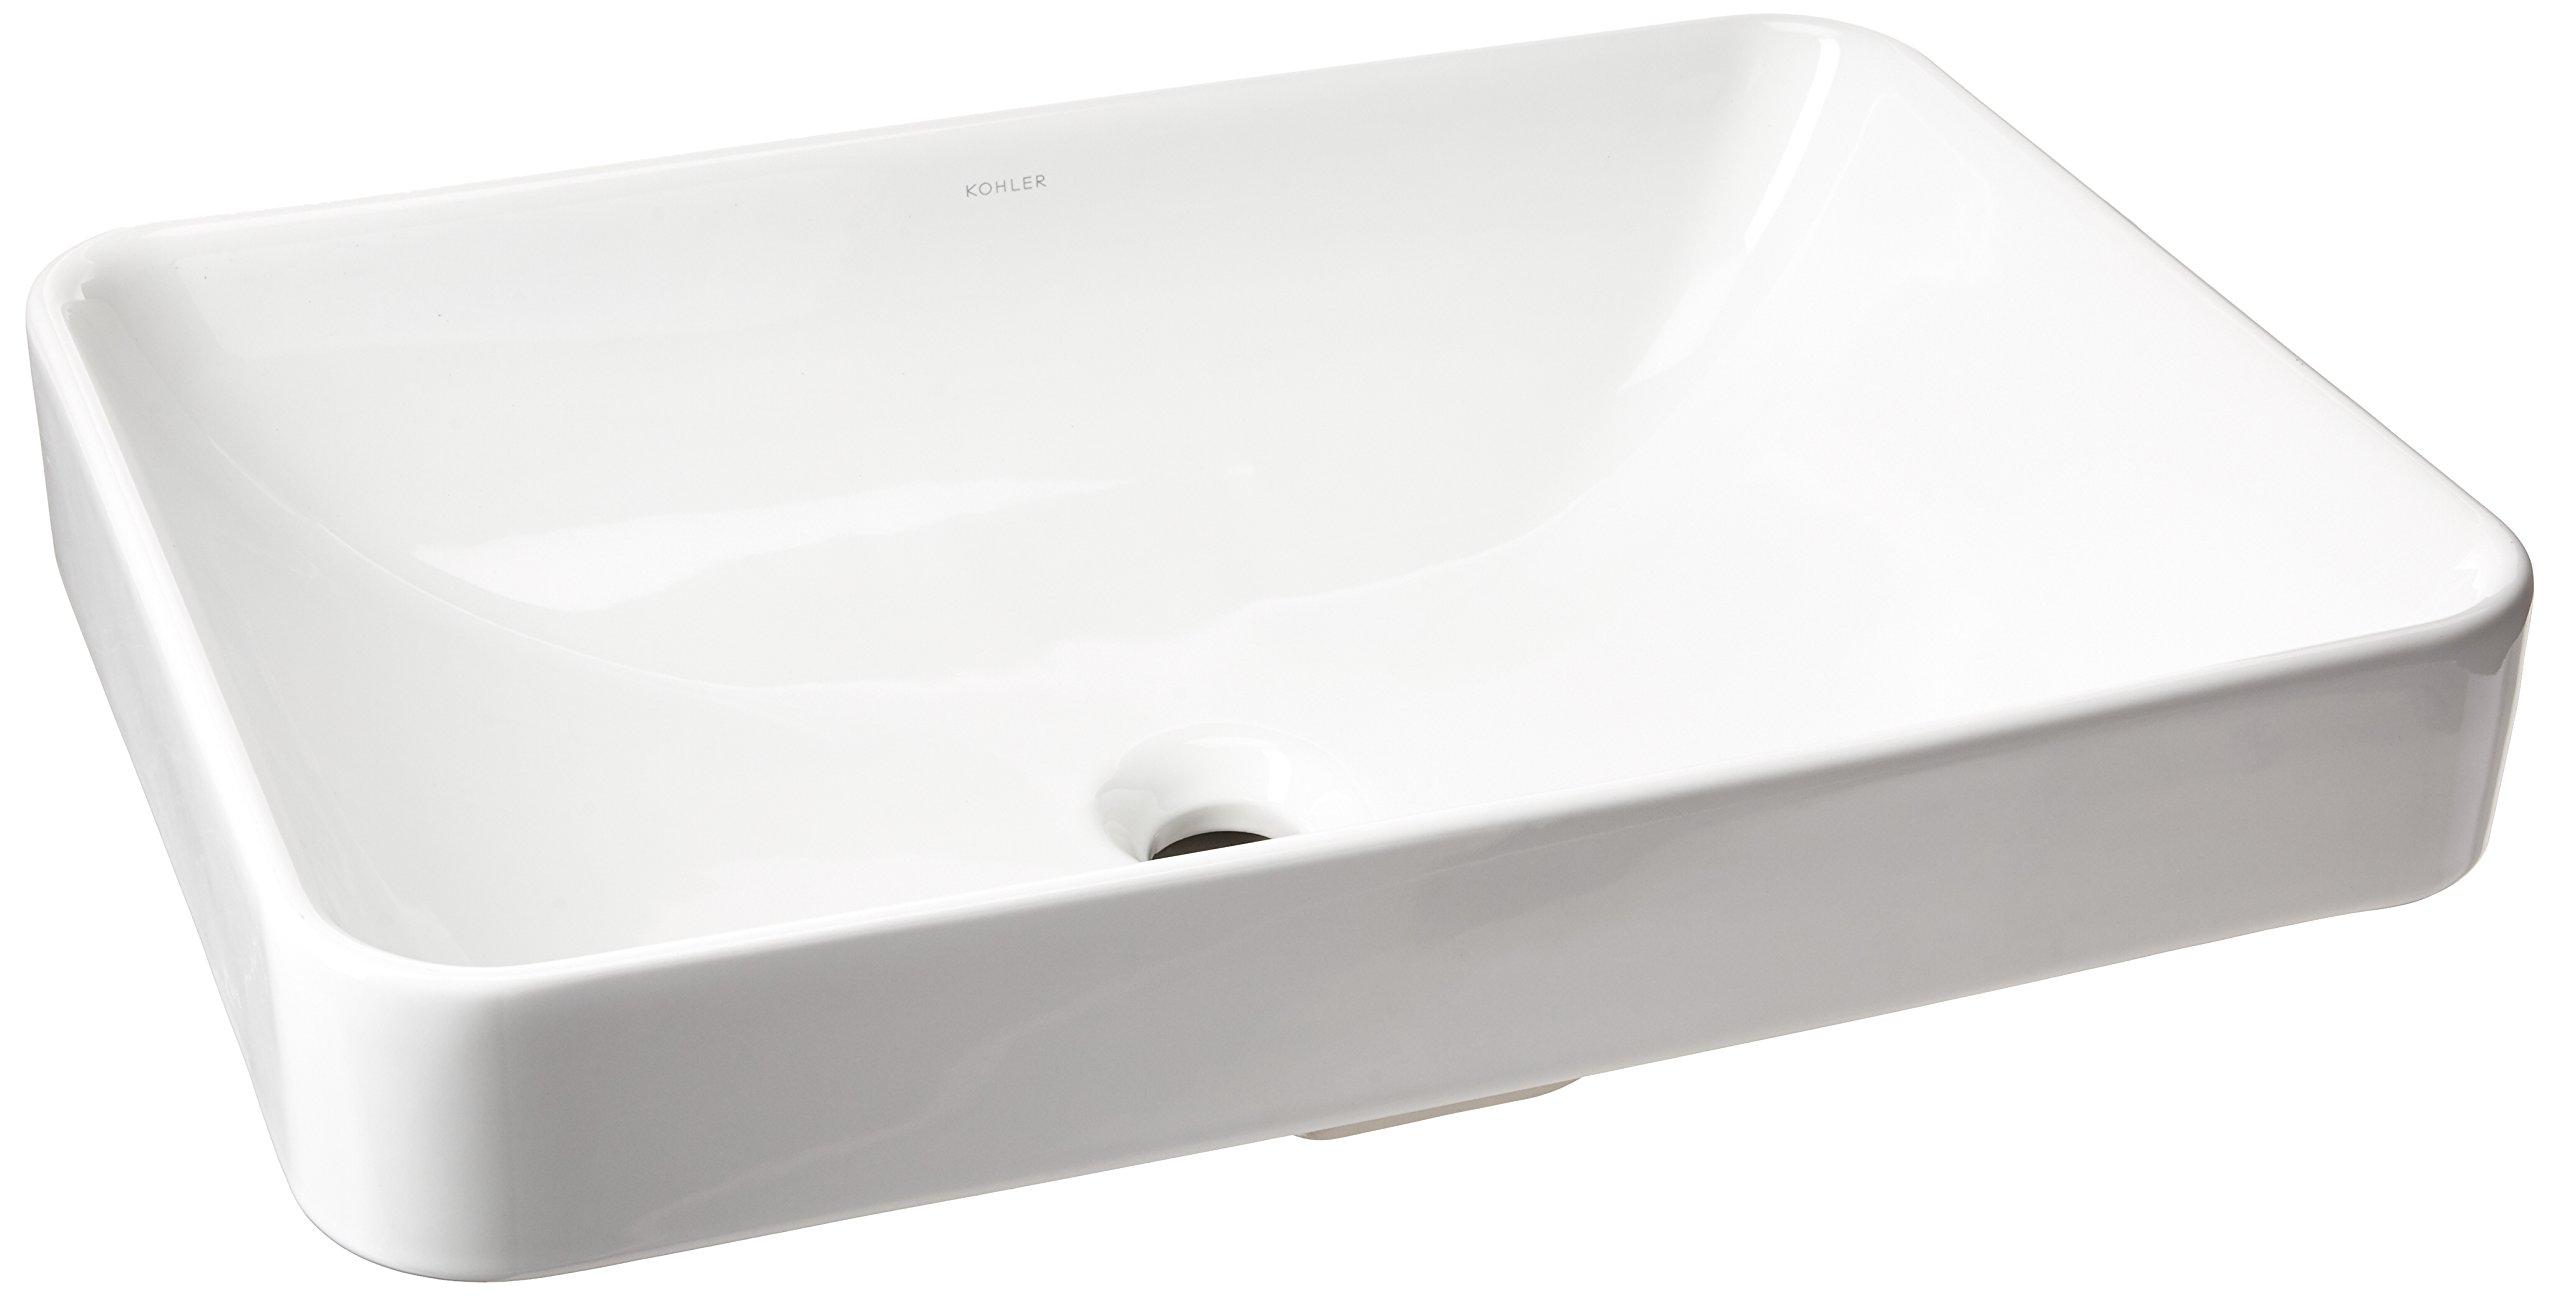 KOHLER K-5373-0 Vox Rectangle Vessel Above-Counter Bathroom Sink, White